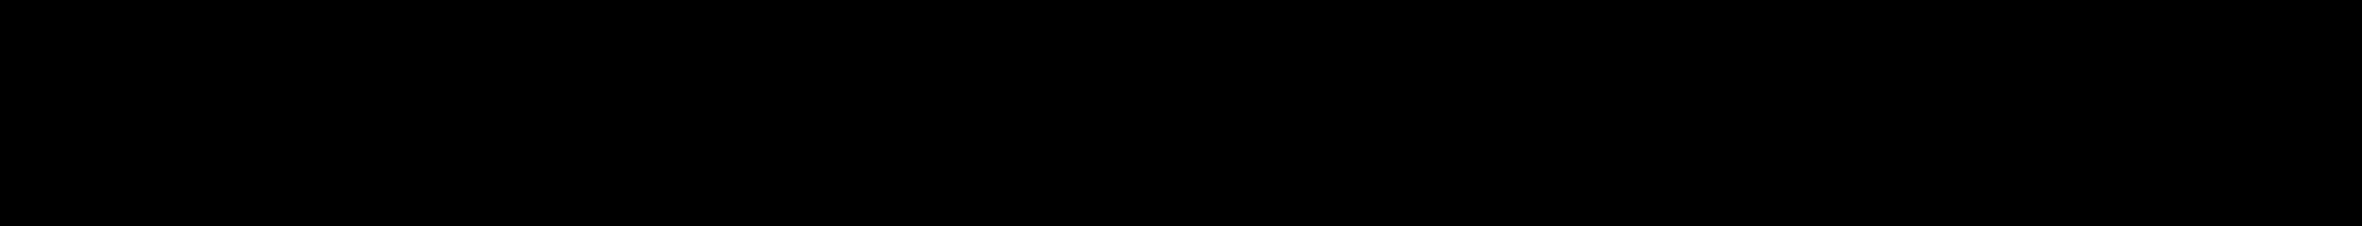 ZENITH-HORIZ-WATCHES-ETOILE-POS.png